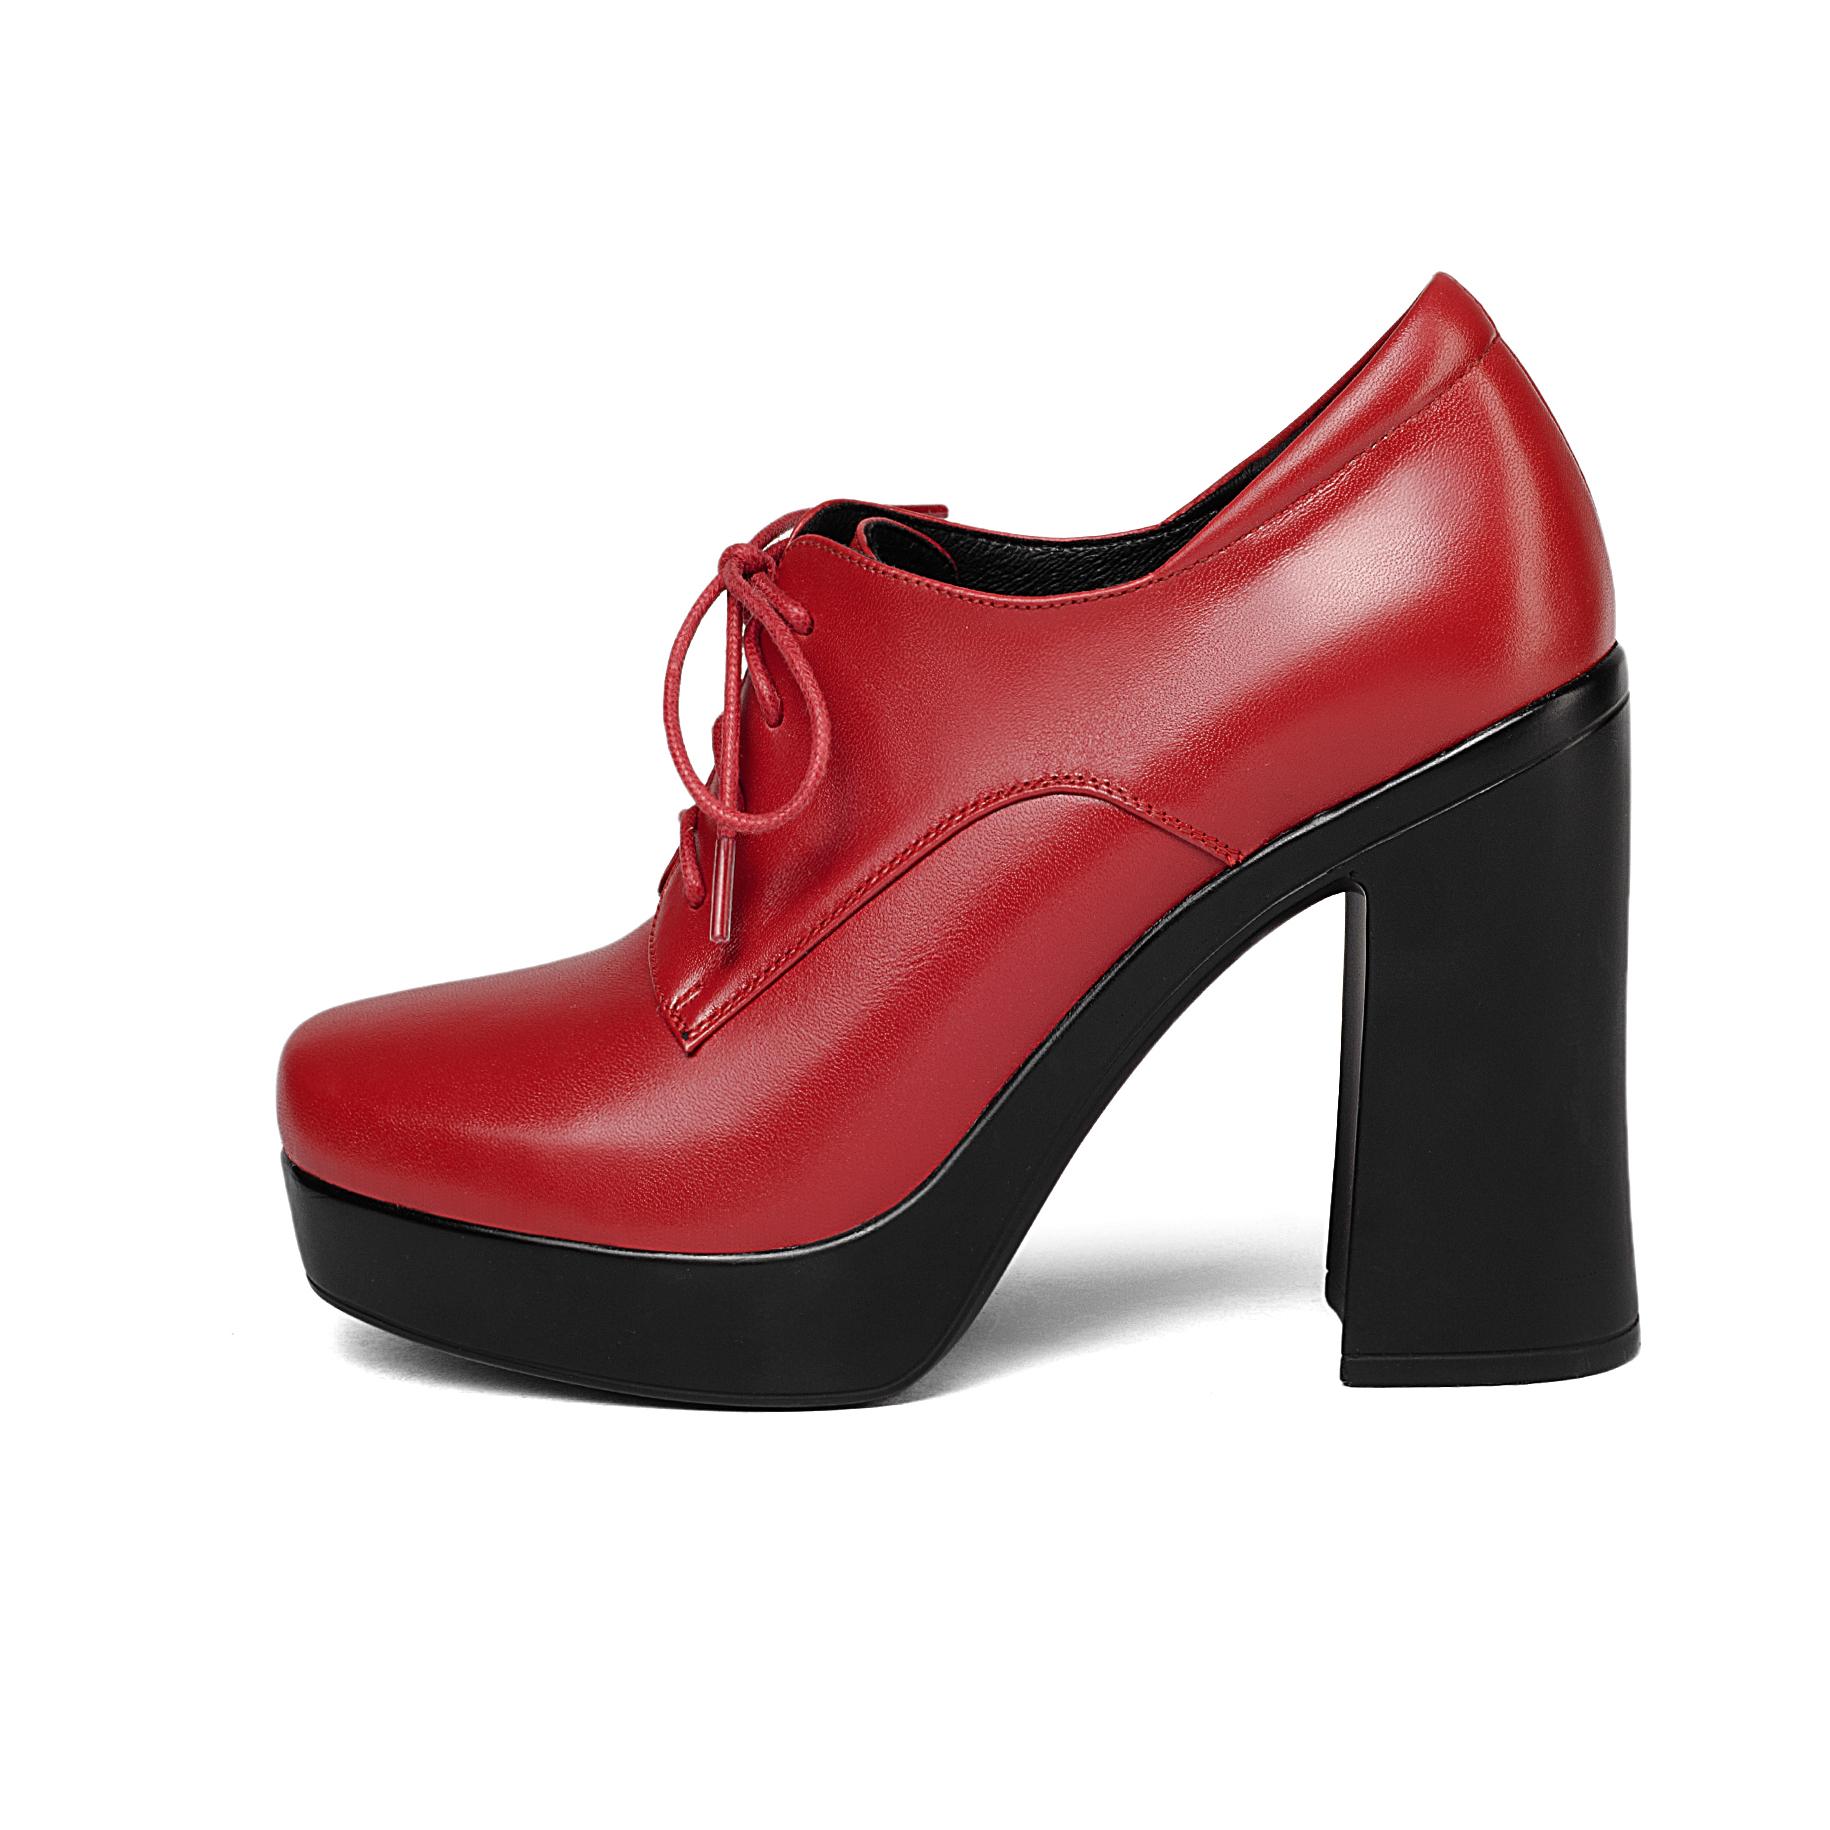 910448eed US  58 - Arden Furtado 2018 spring autumn high heels 11cm platform ...